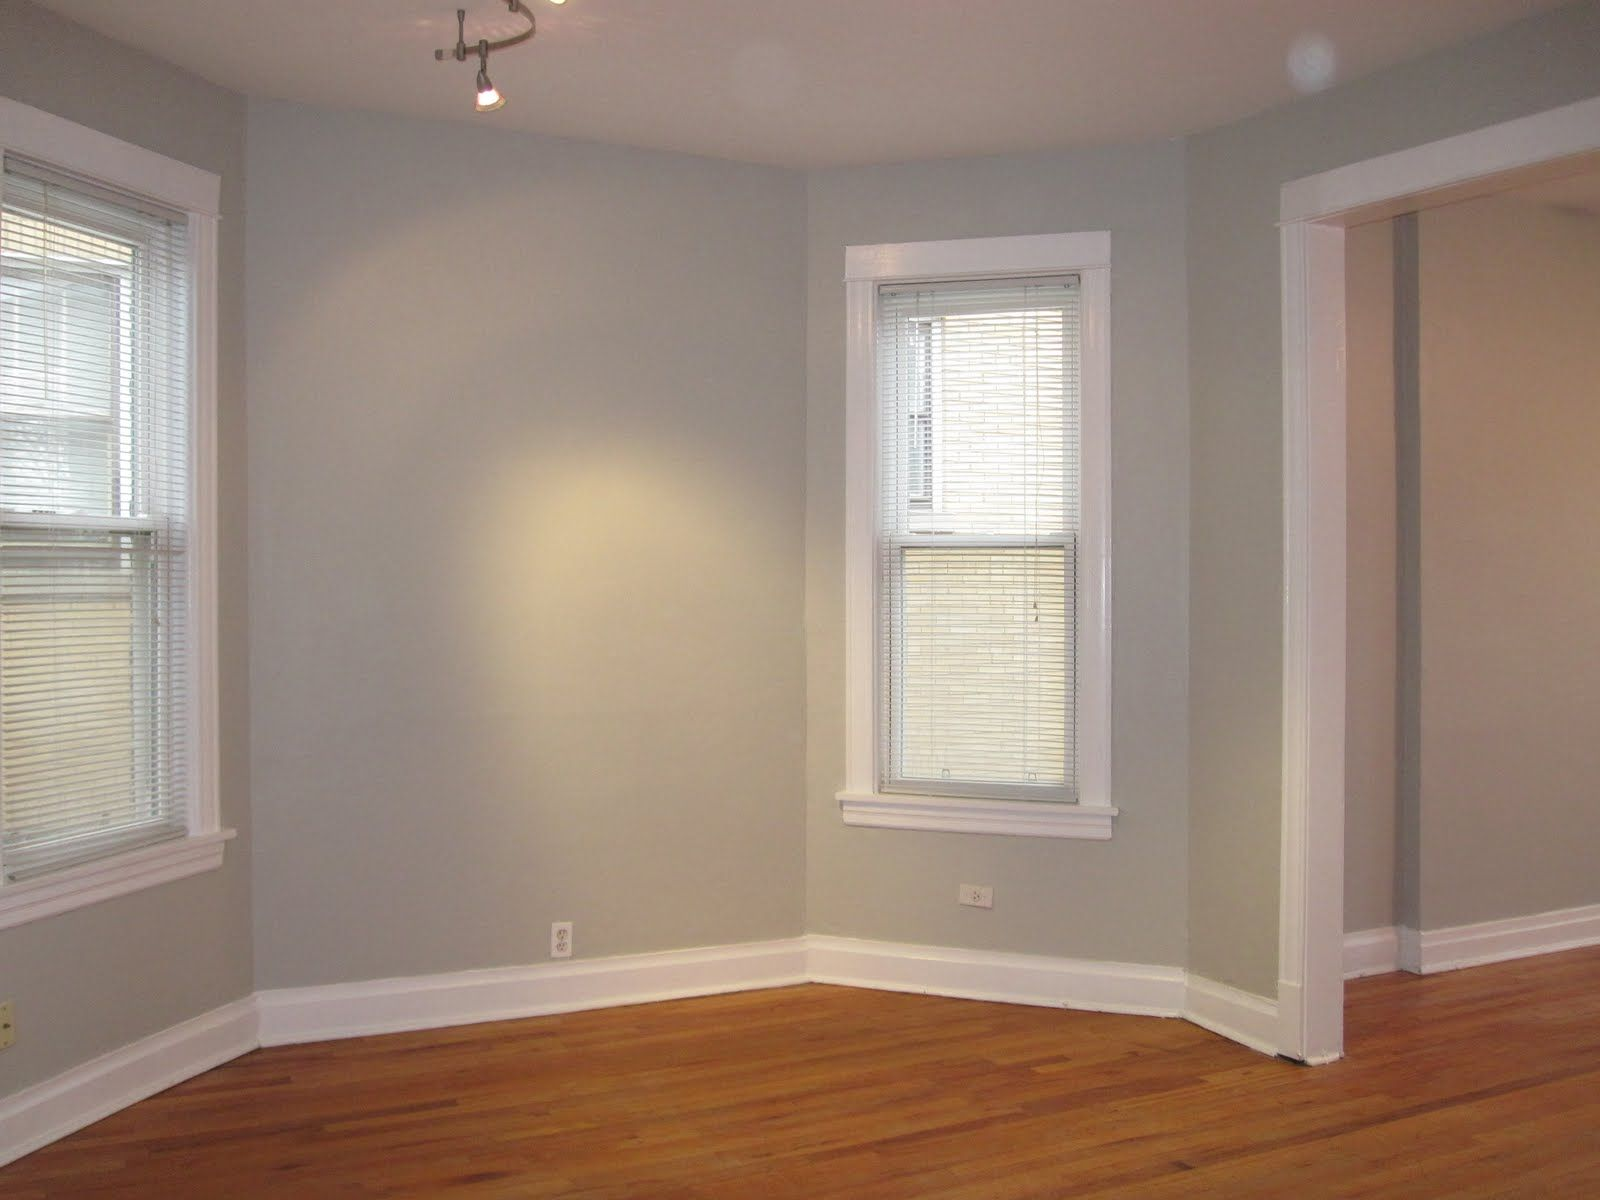 Best New Apartment Sneak Peak Living Room Dining Room In 2019 Behr Paint Colors Behr Paint 400 x 300